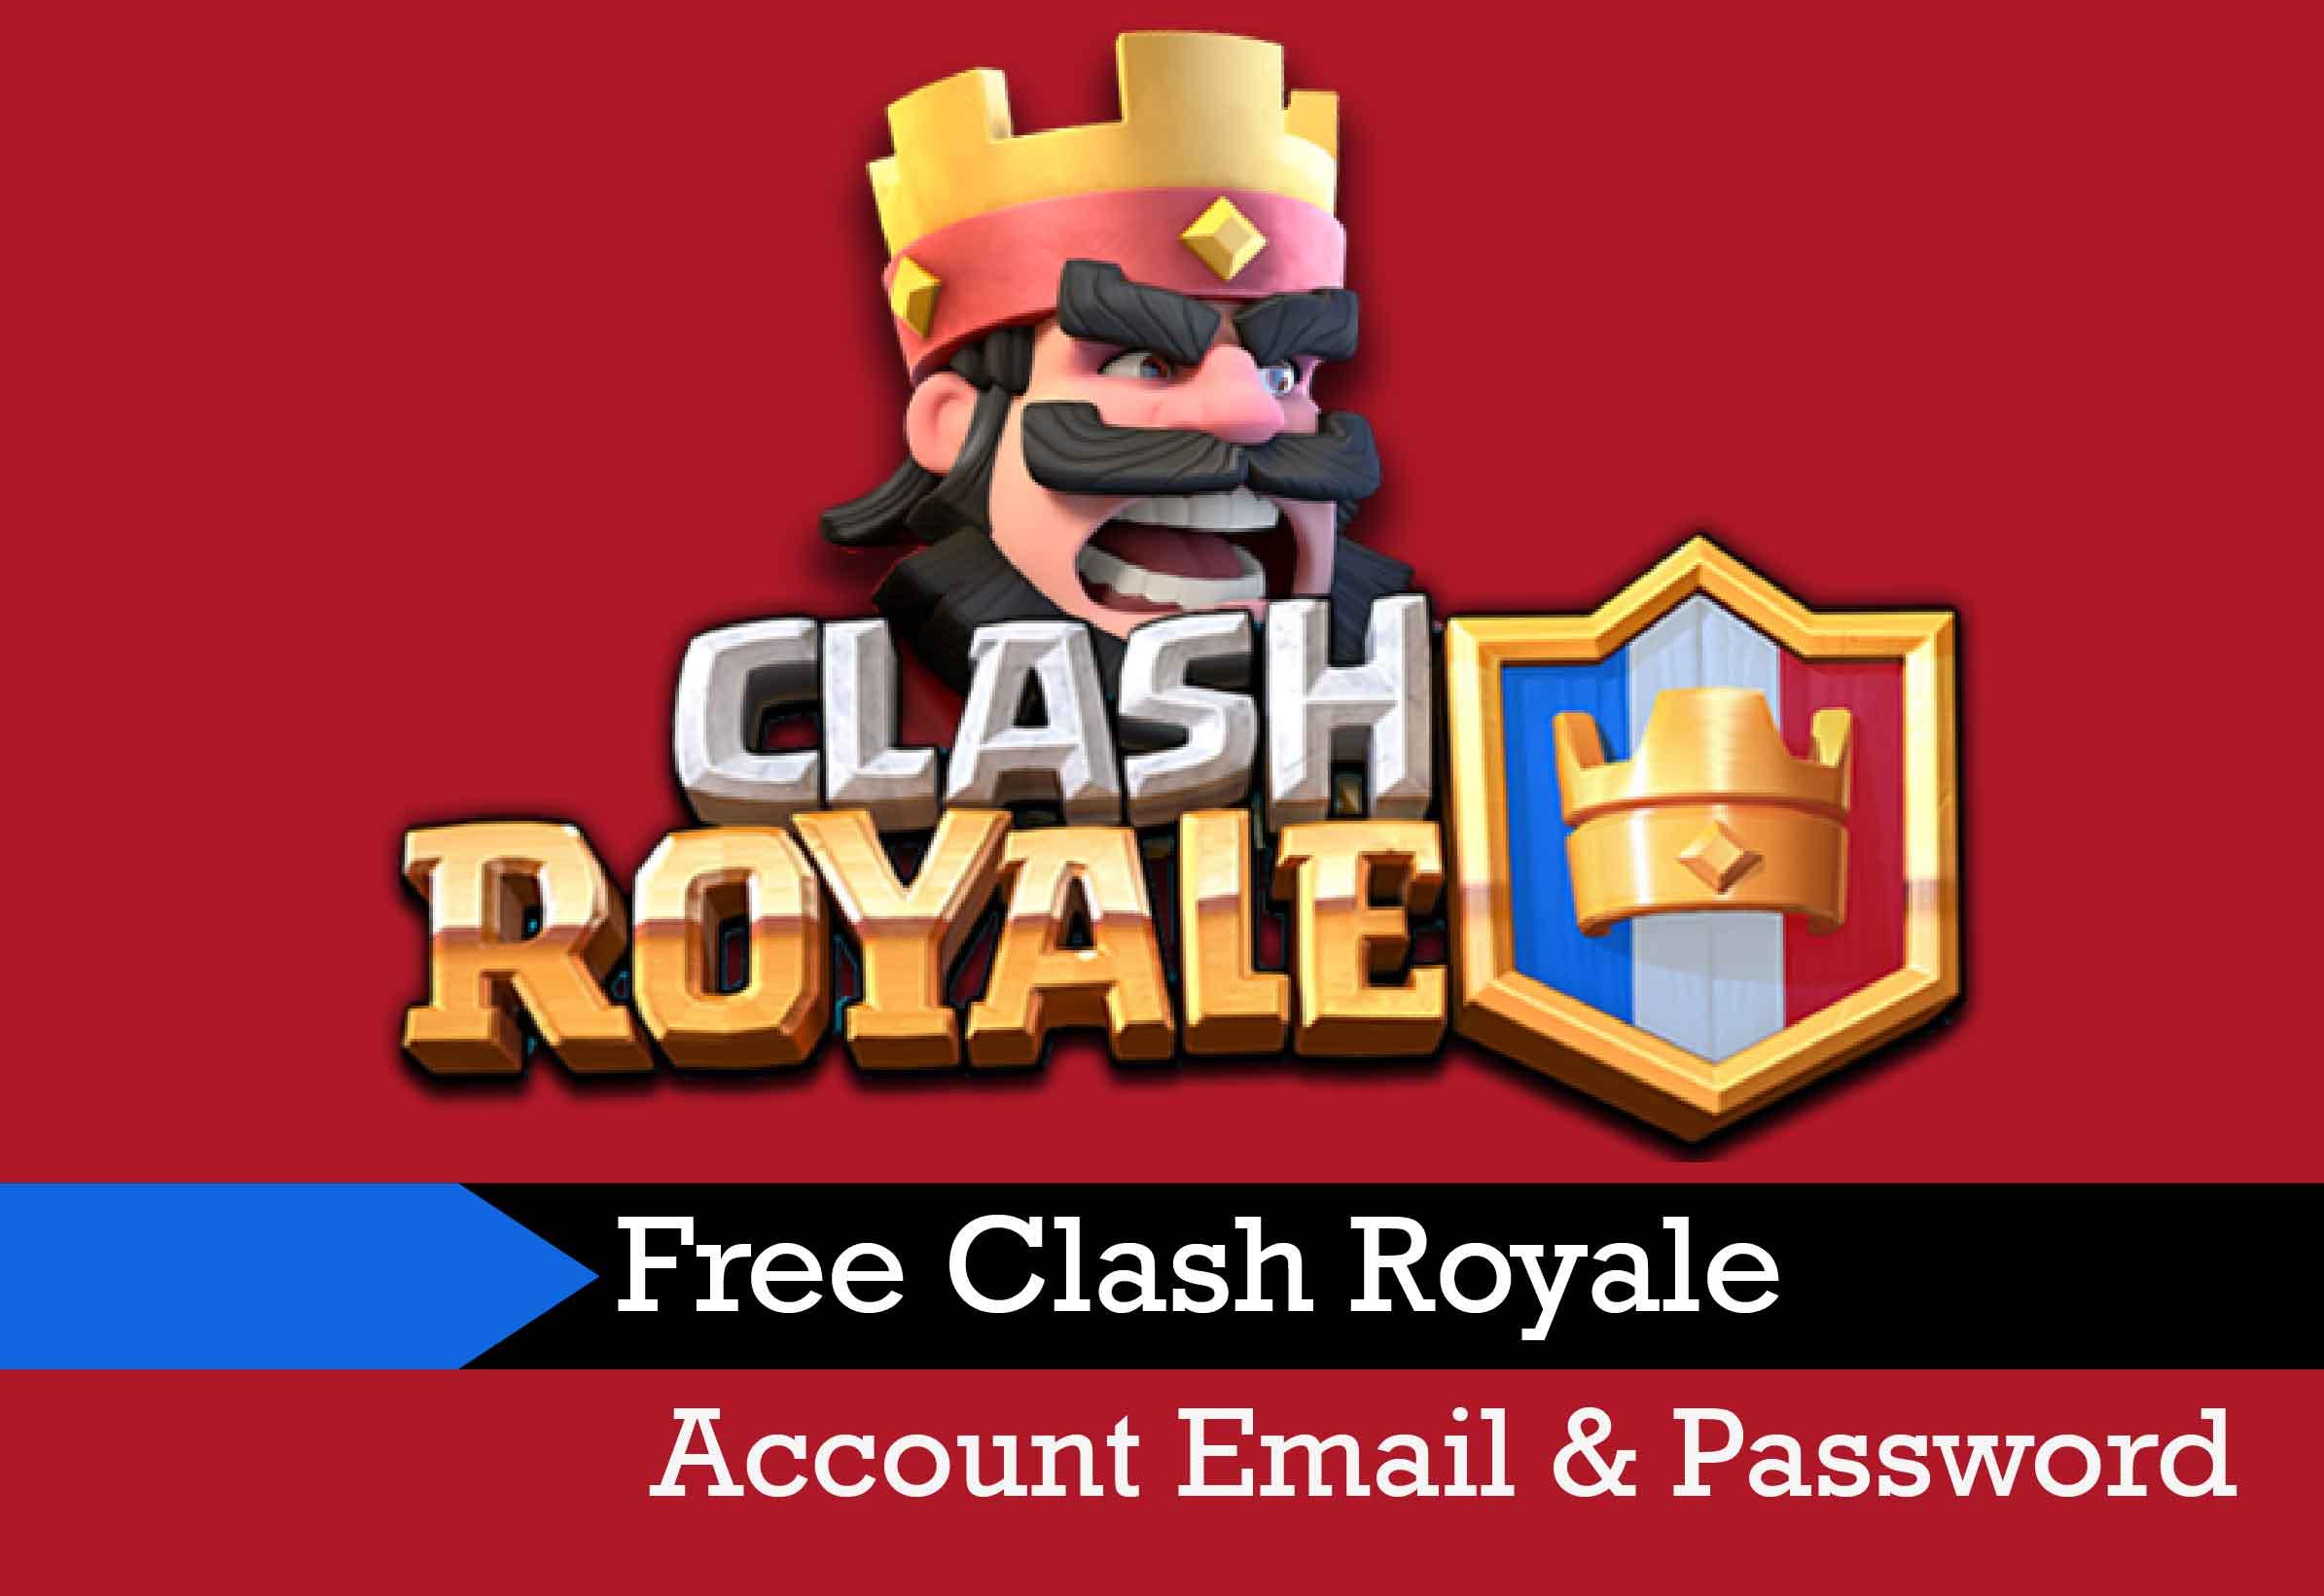 Free Clash Royale Account